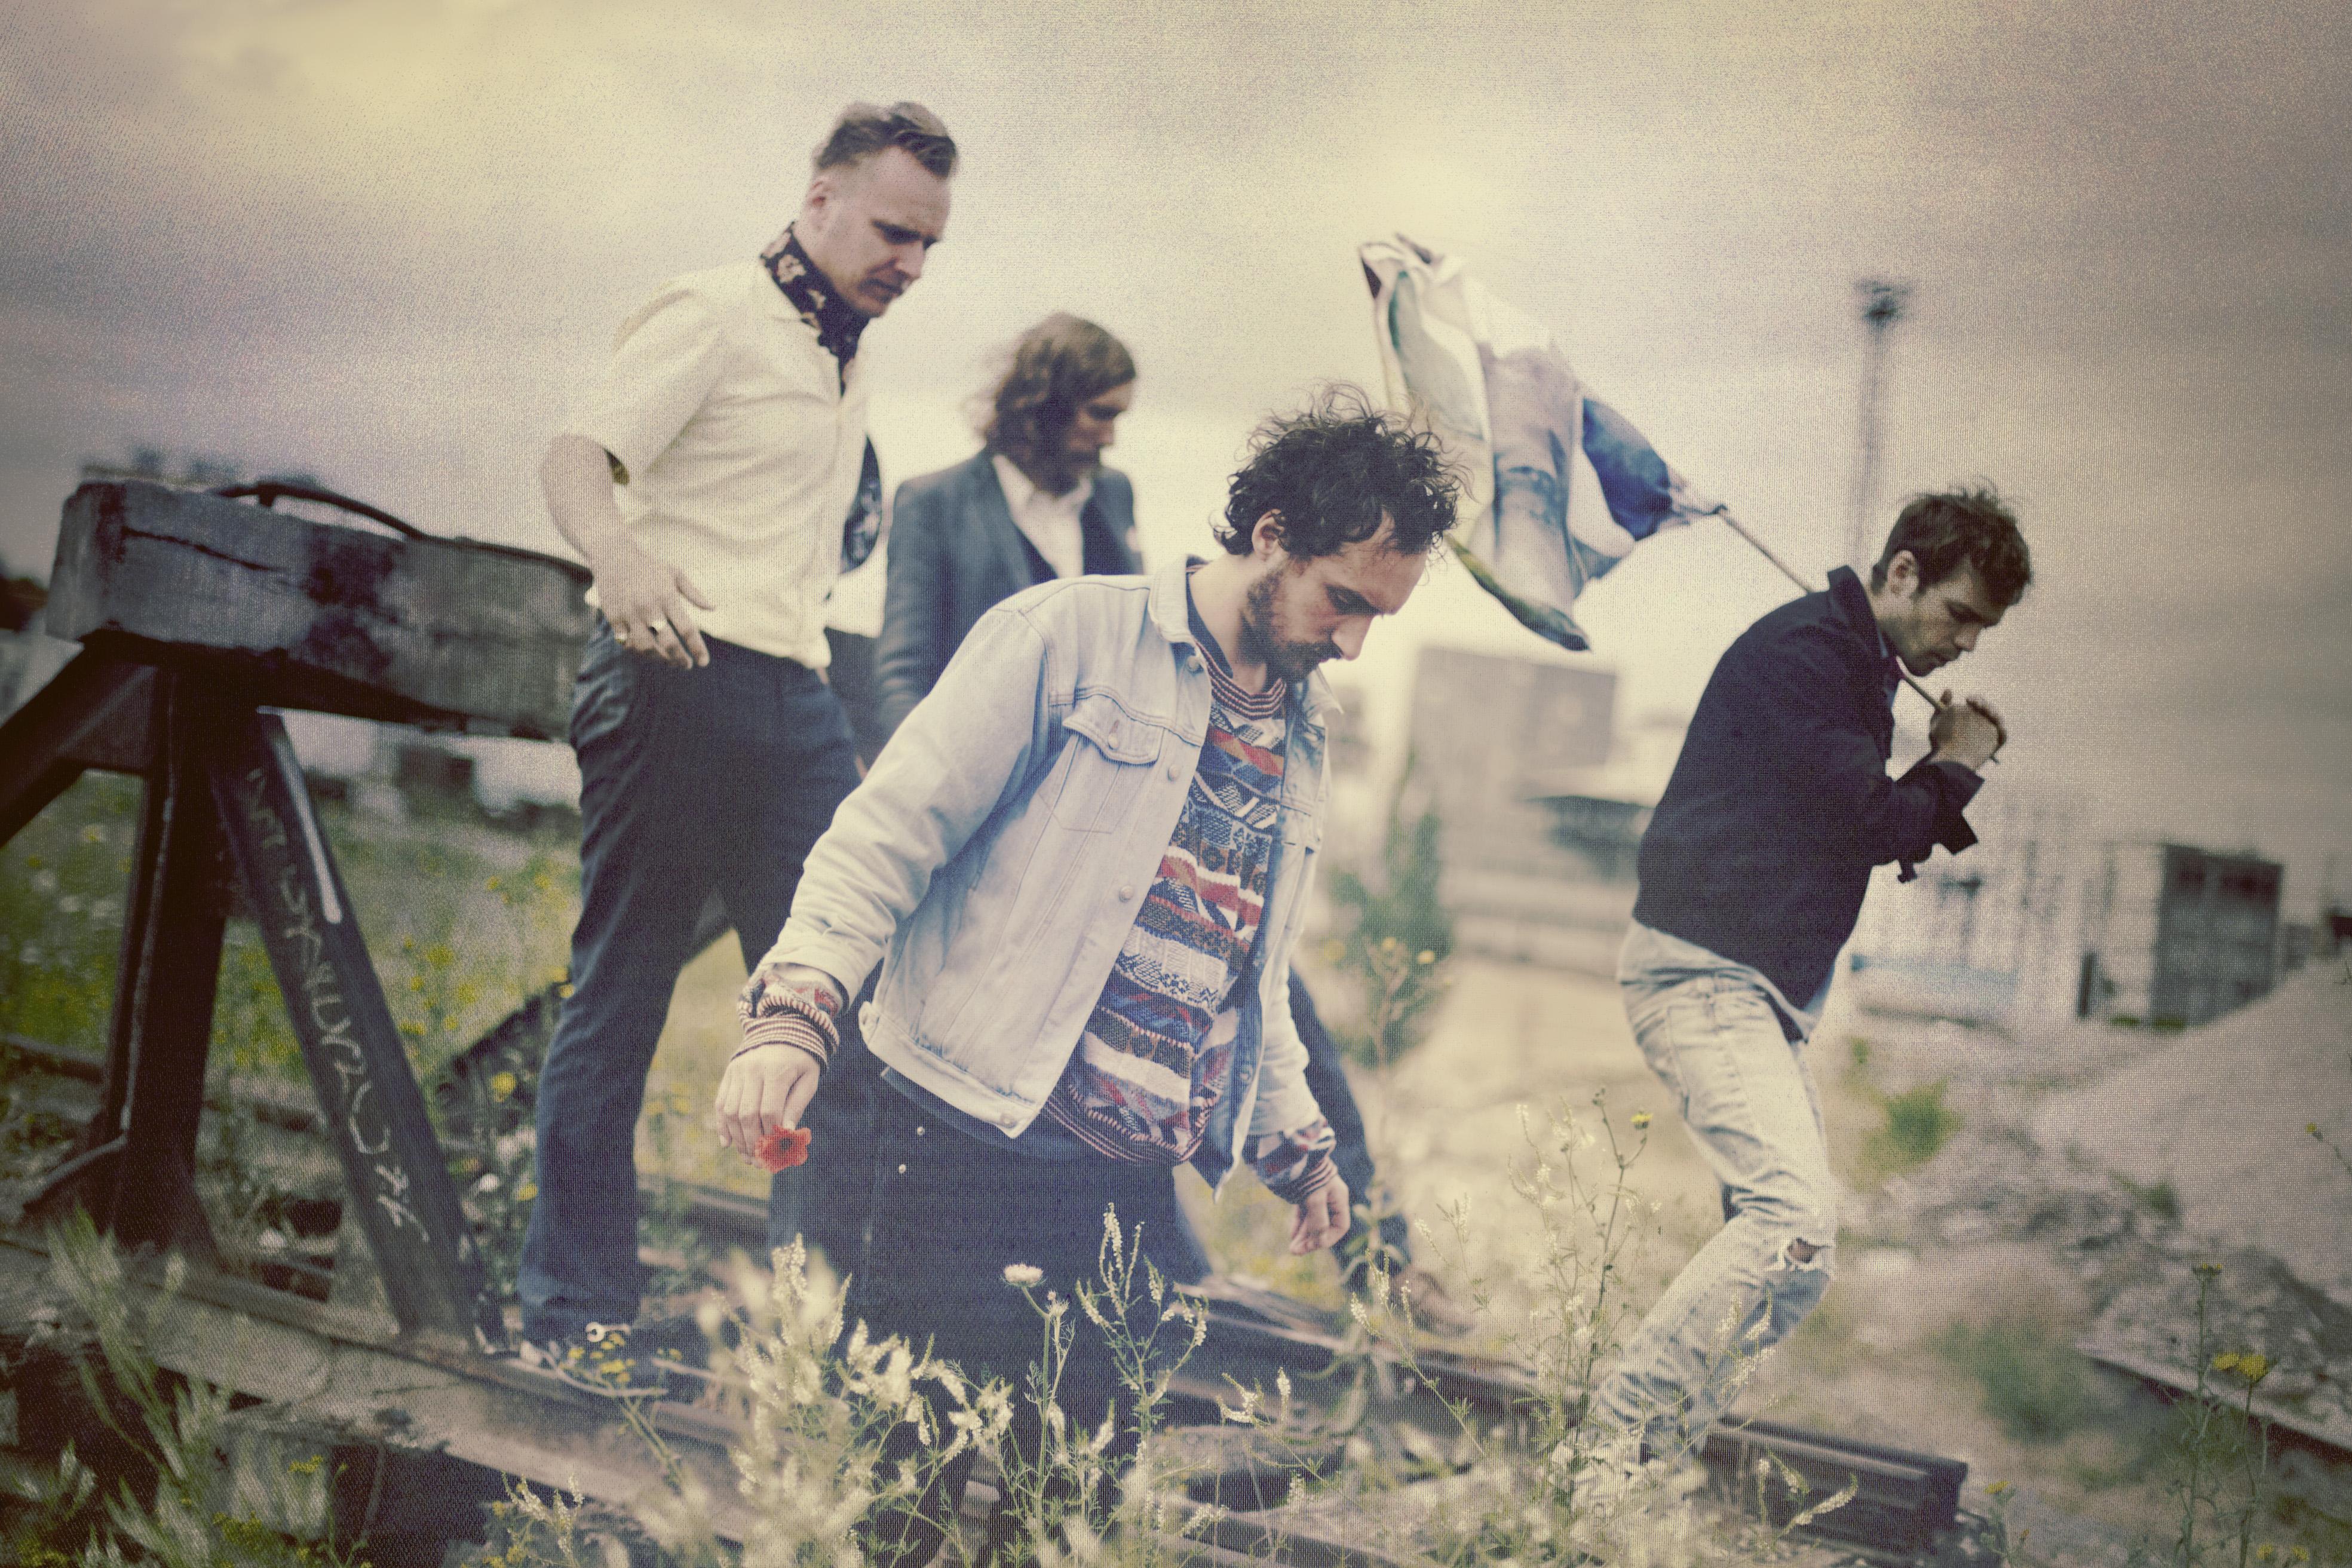 4 Guys From The Future - Adagio